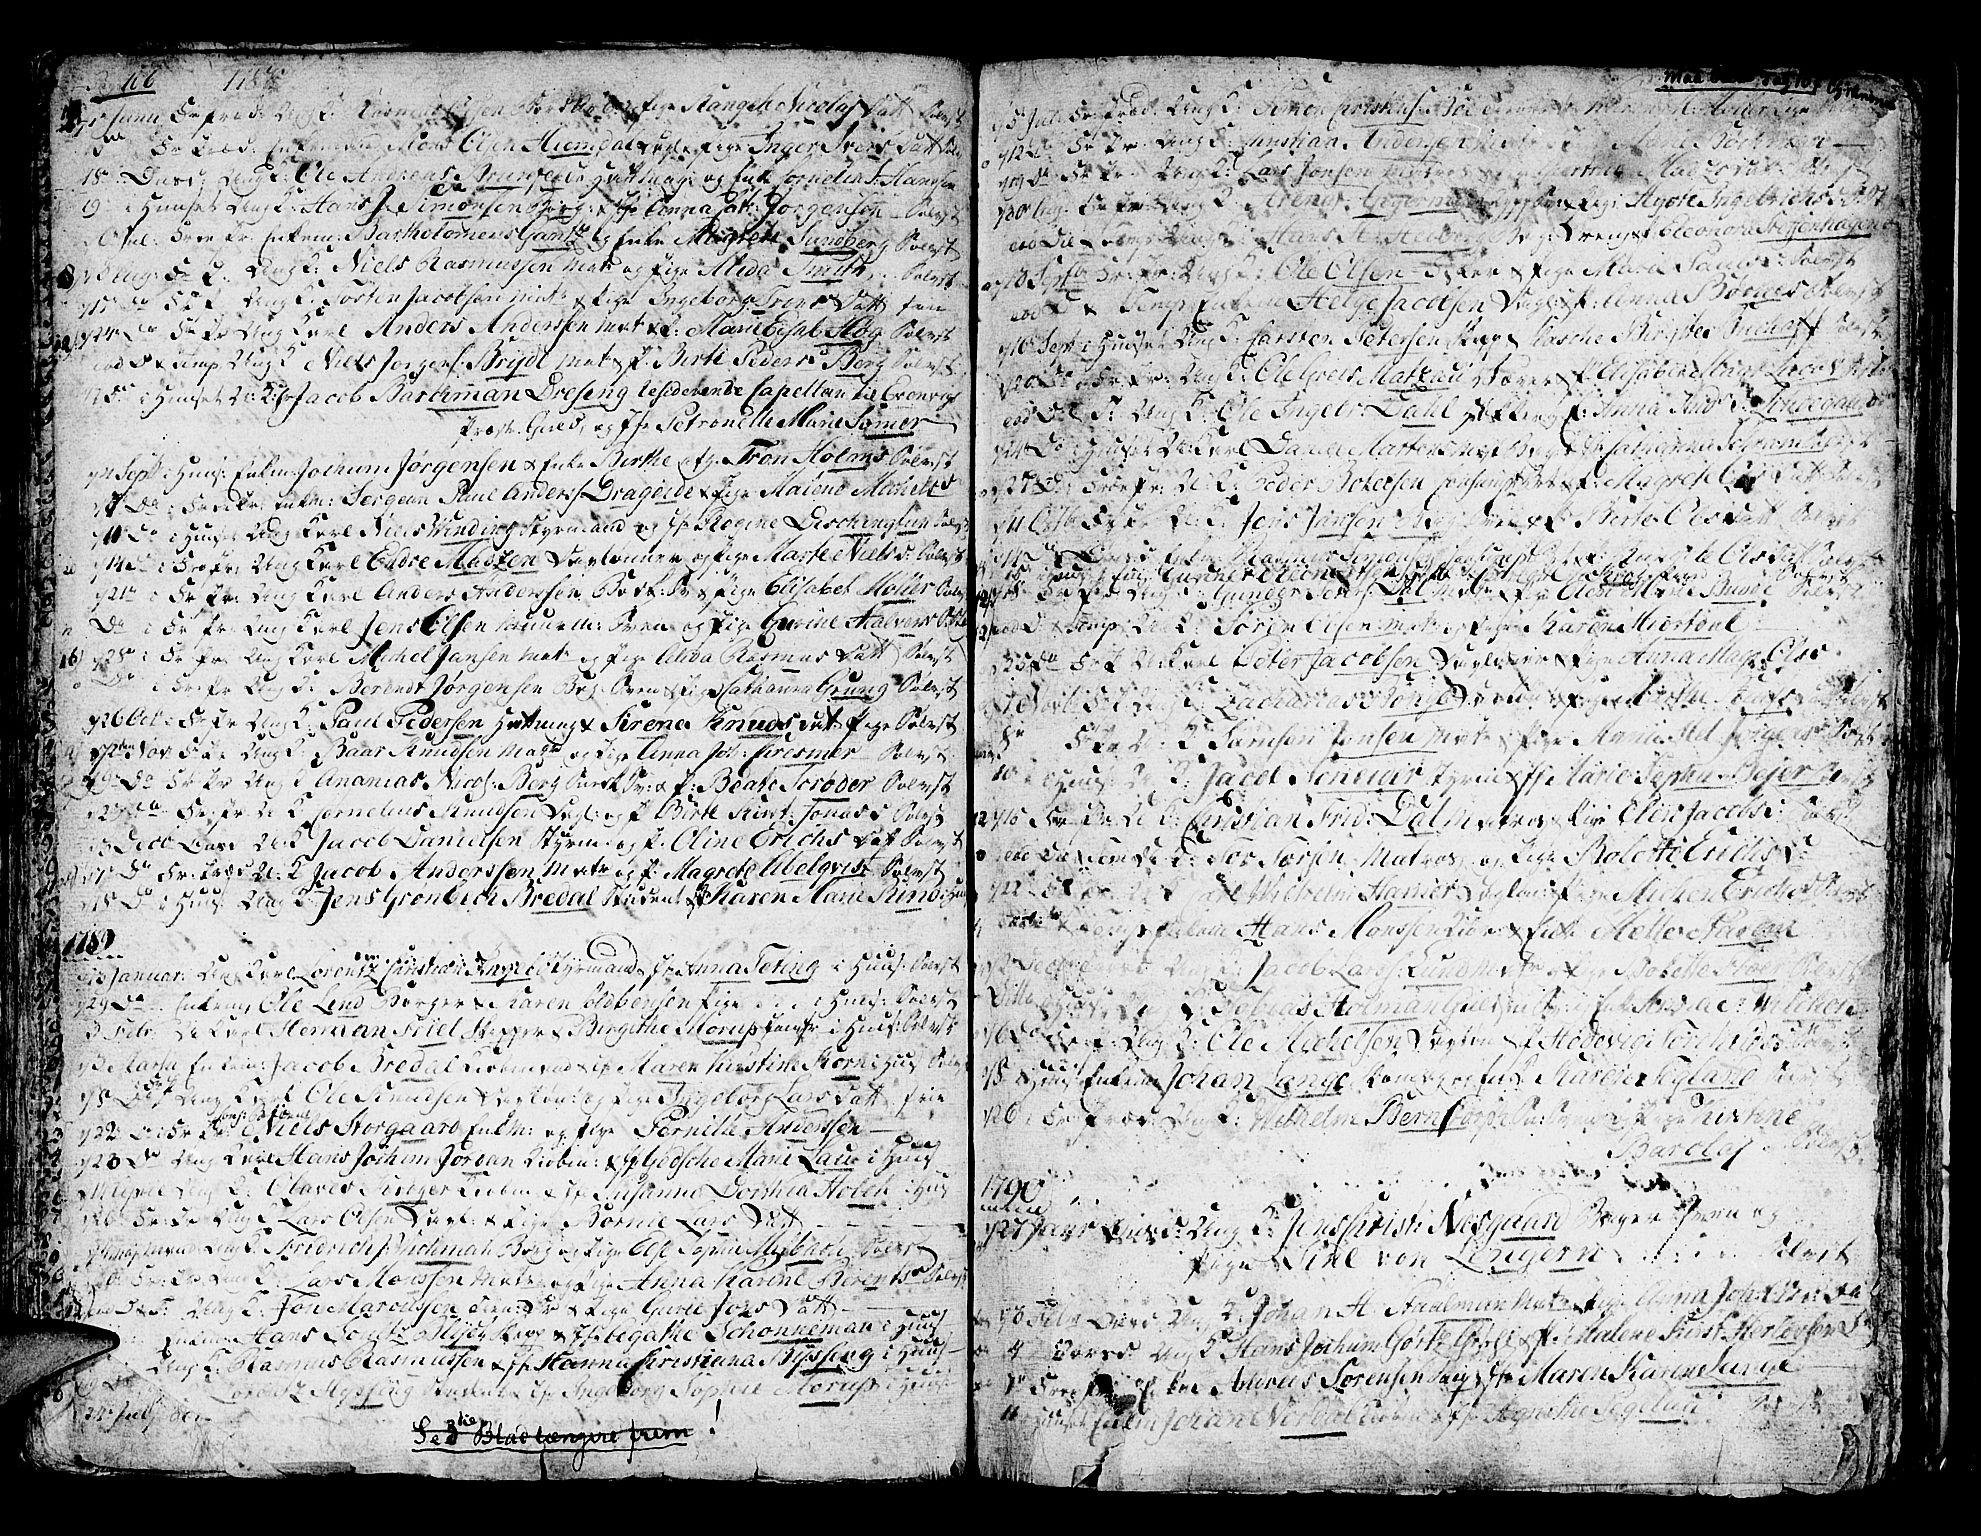 SAB, Domkirken sokneprestembete, H/Haa/L0007: Ministerialbok nr. A 7, 1725-1826, s. 106-107